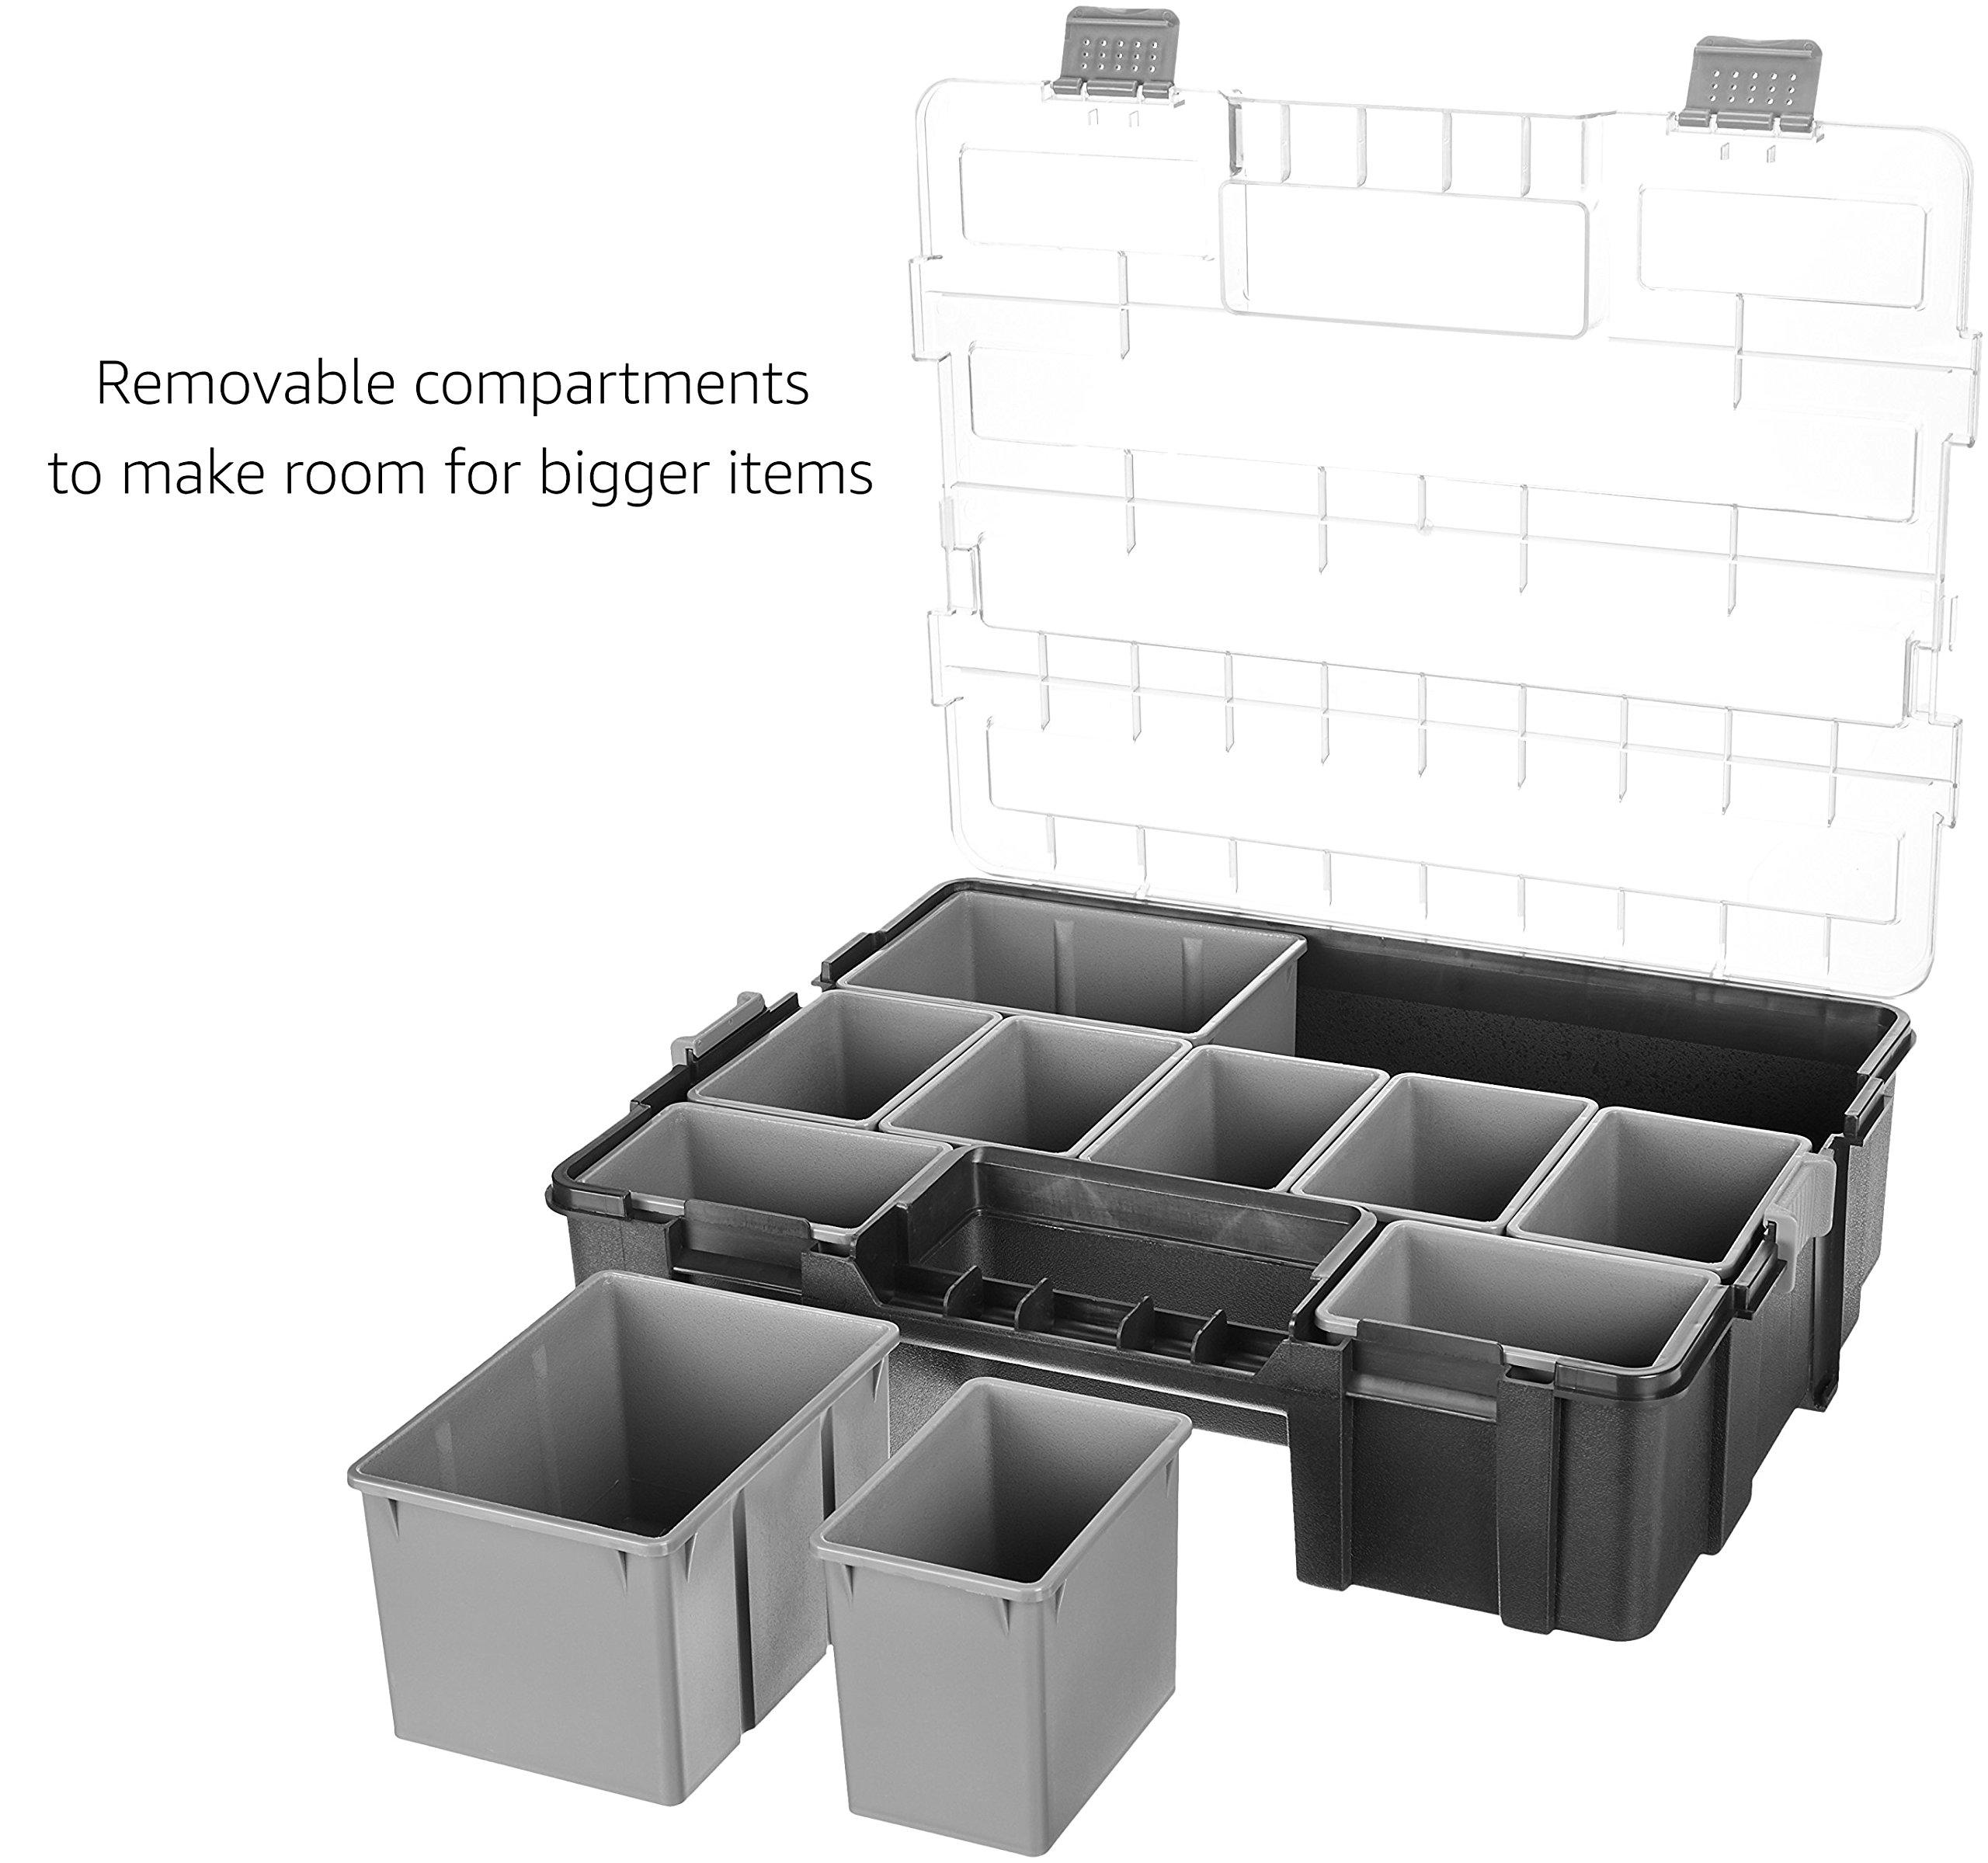 AmazonBasics Tool Organizer - 10 Compartments by AmazonBasics (Image #2)